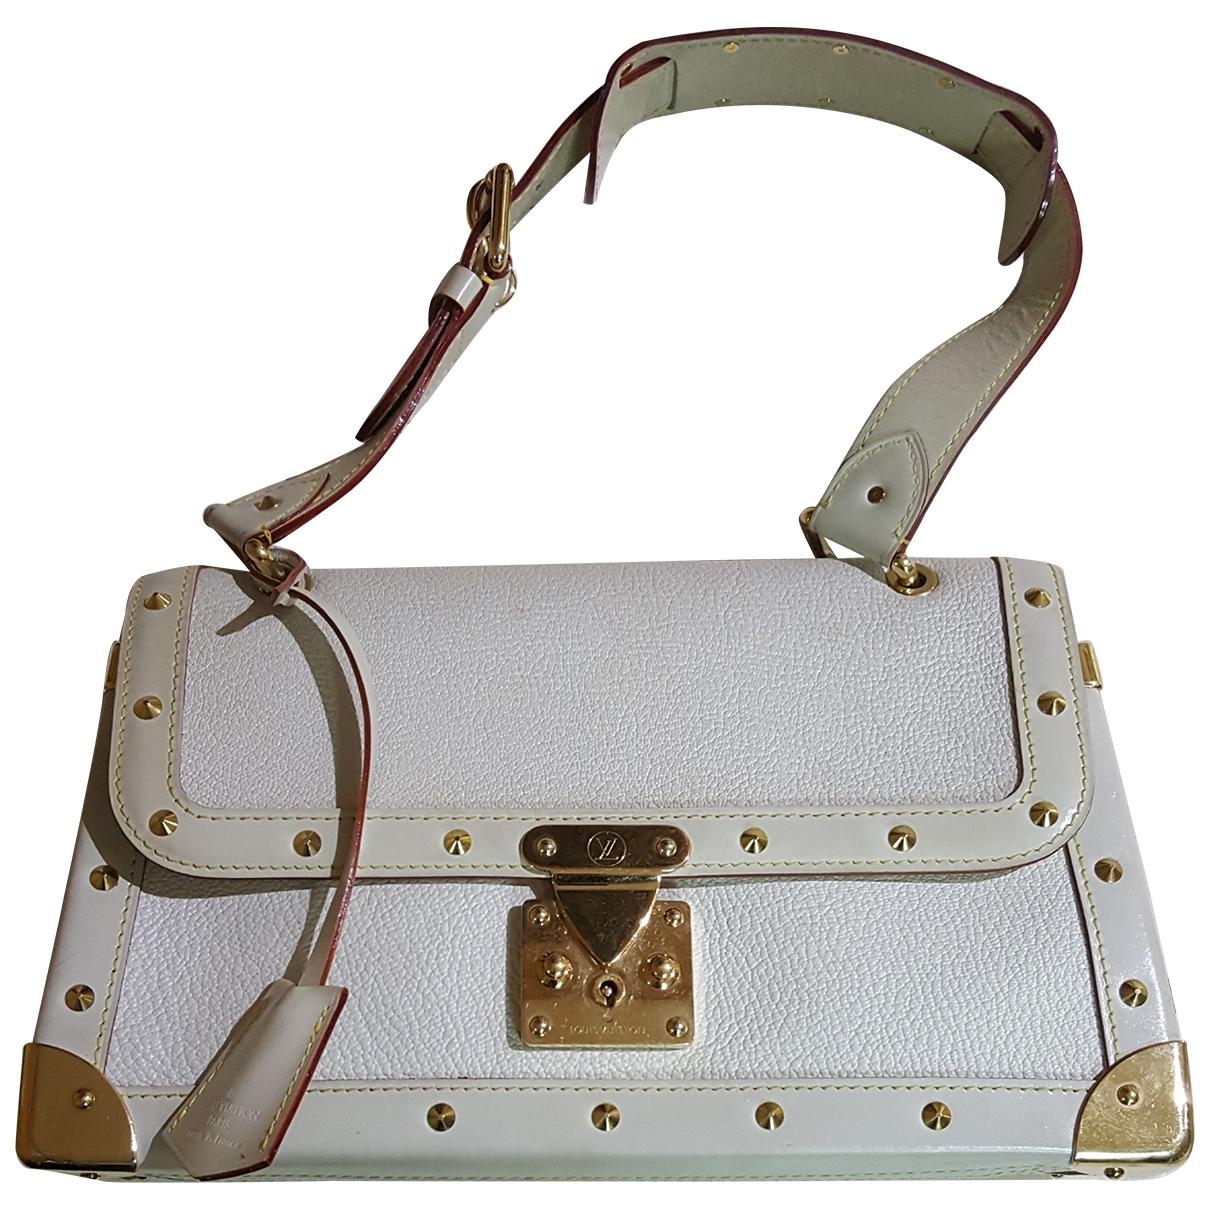 Louis Vuitton Le Fabuleux White Leather handbag for Women \N